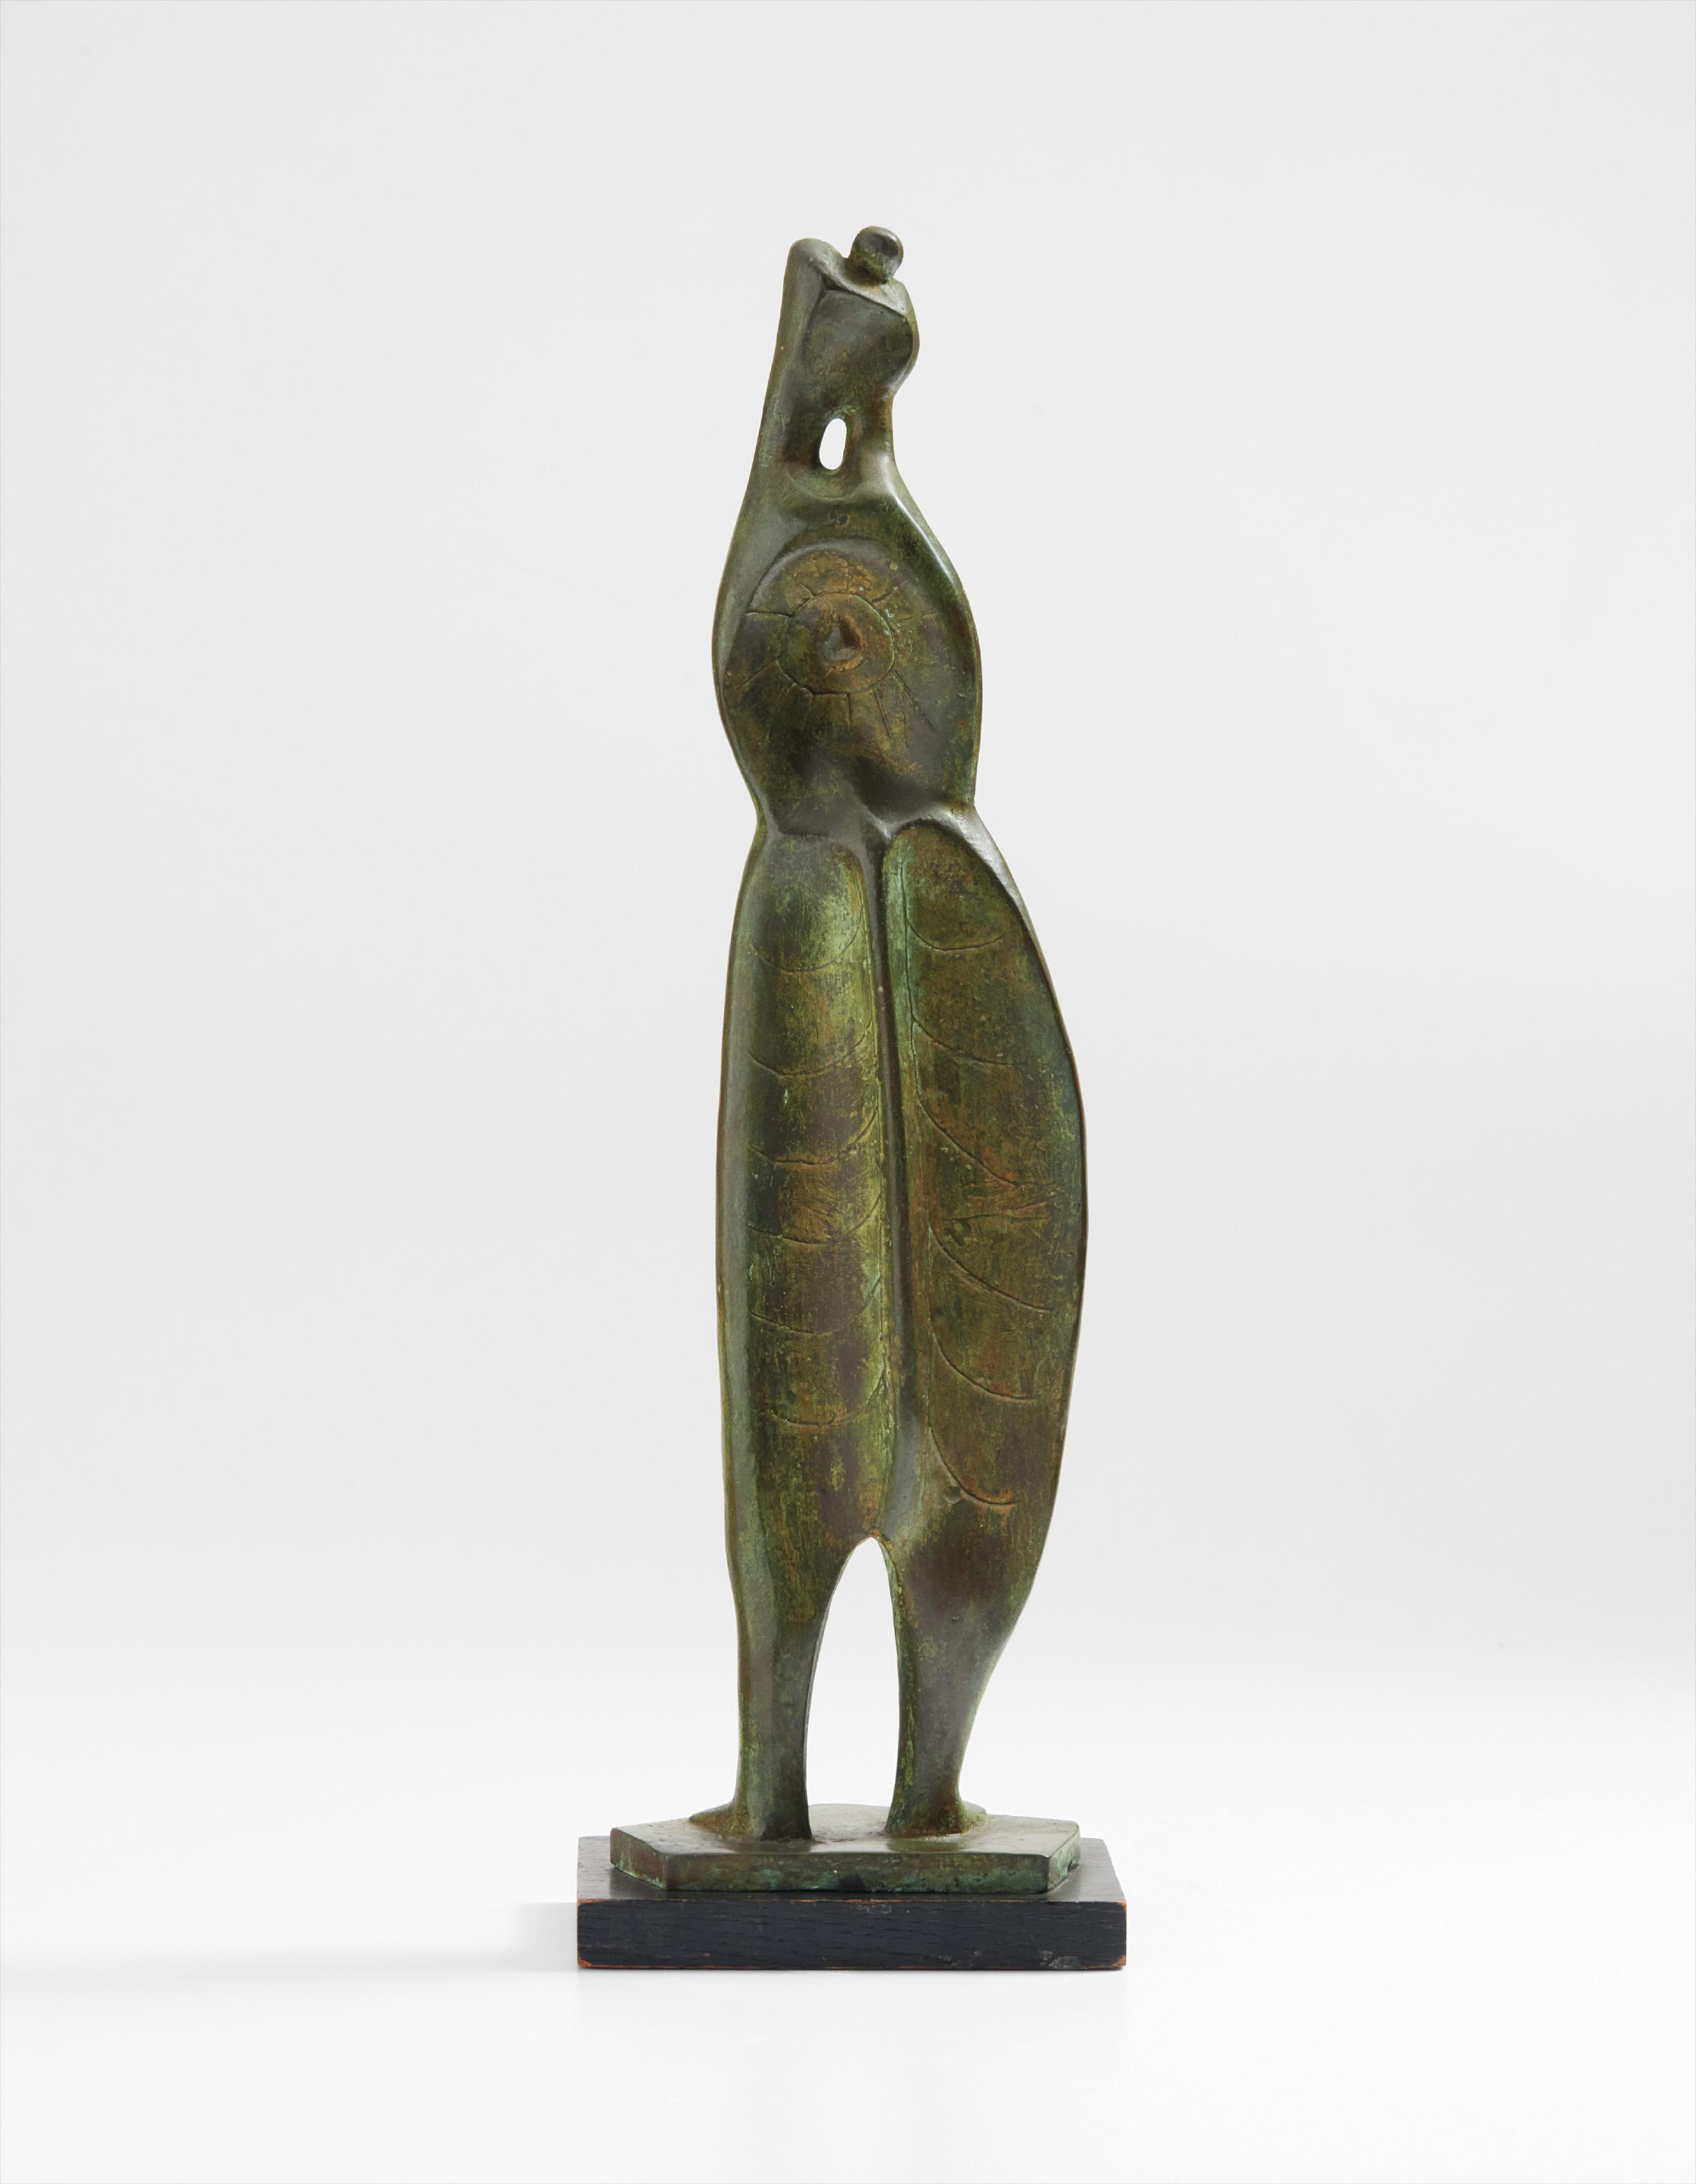 Henry Moore-Leaf Figure No. 3-1952